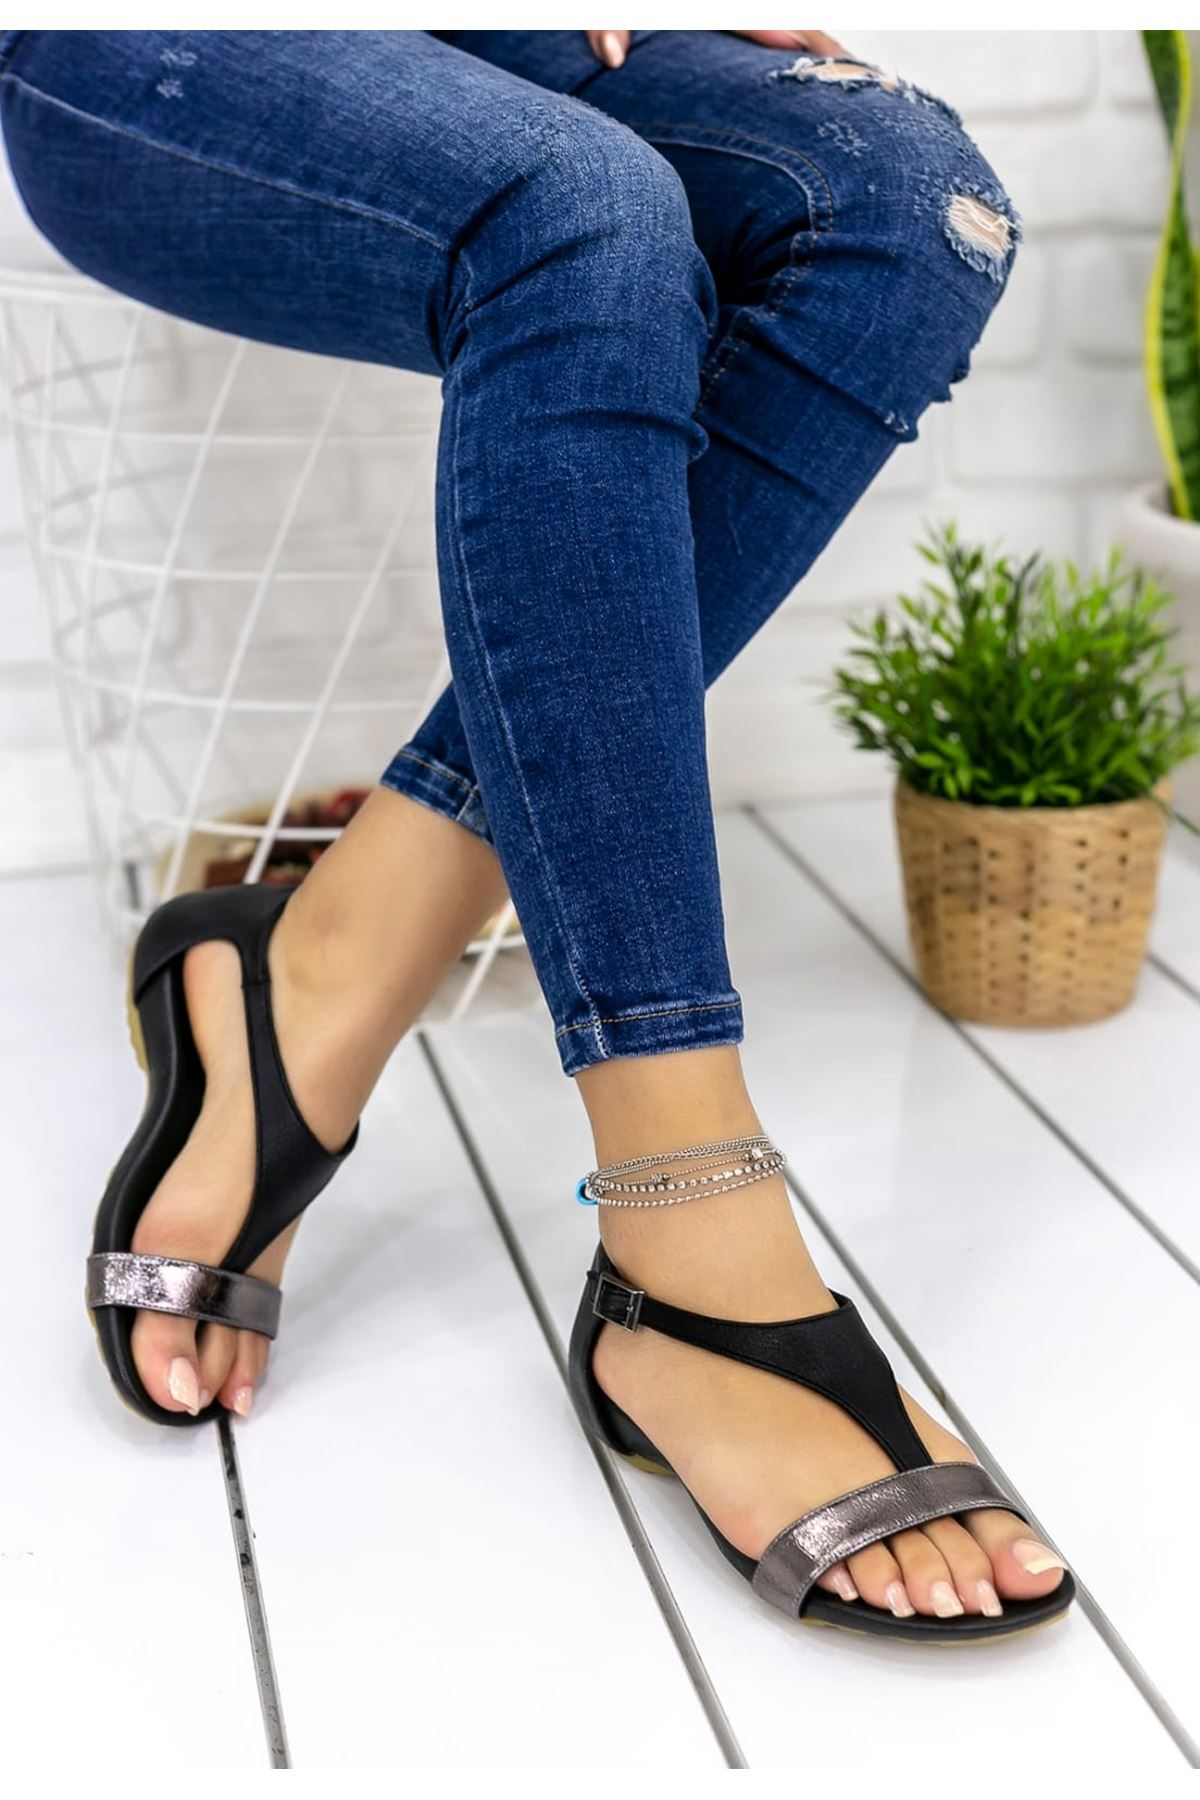 Sunday Mat Deri Tek Bant Parmak Arası Sandalet Siyah